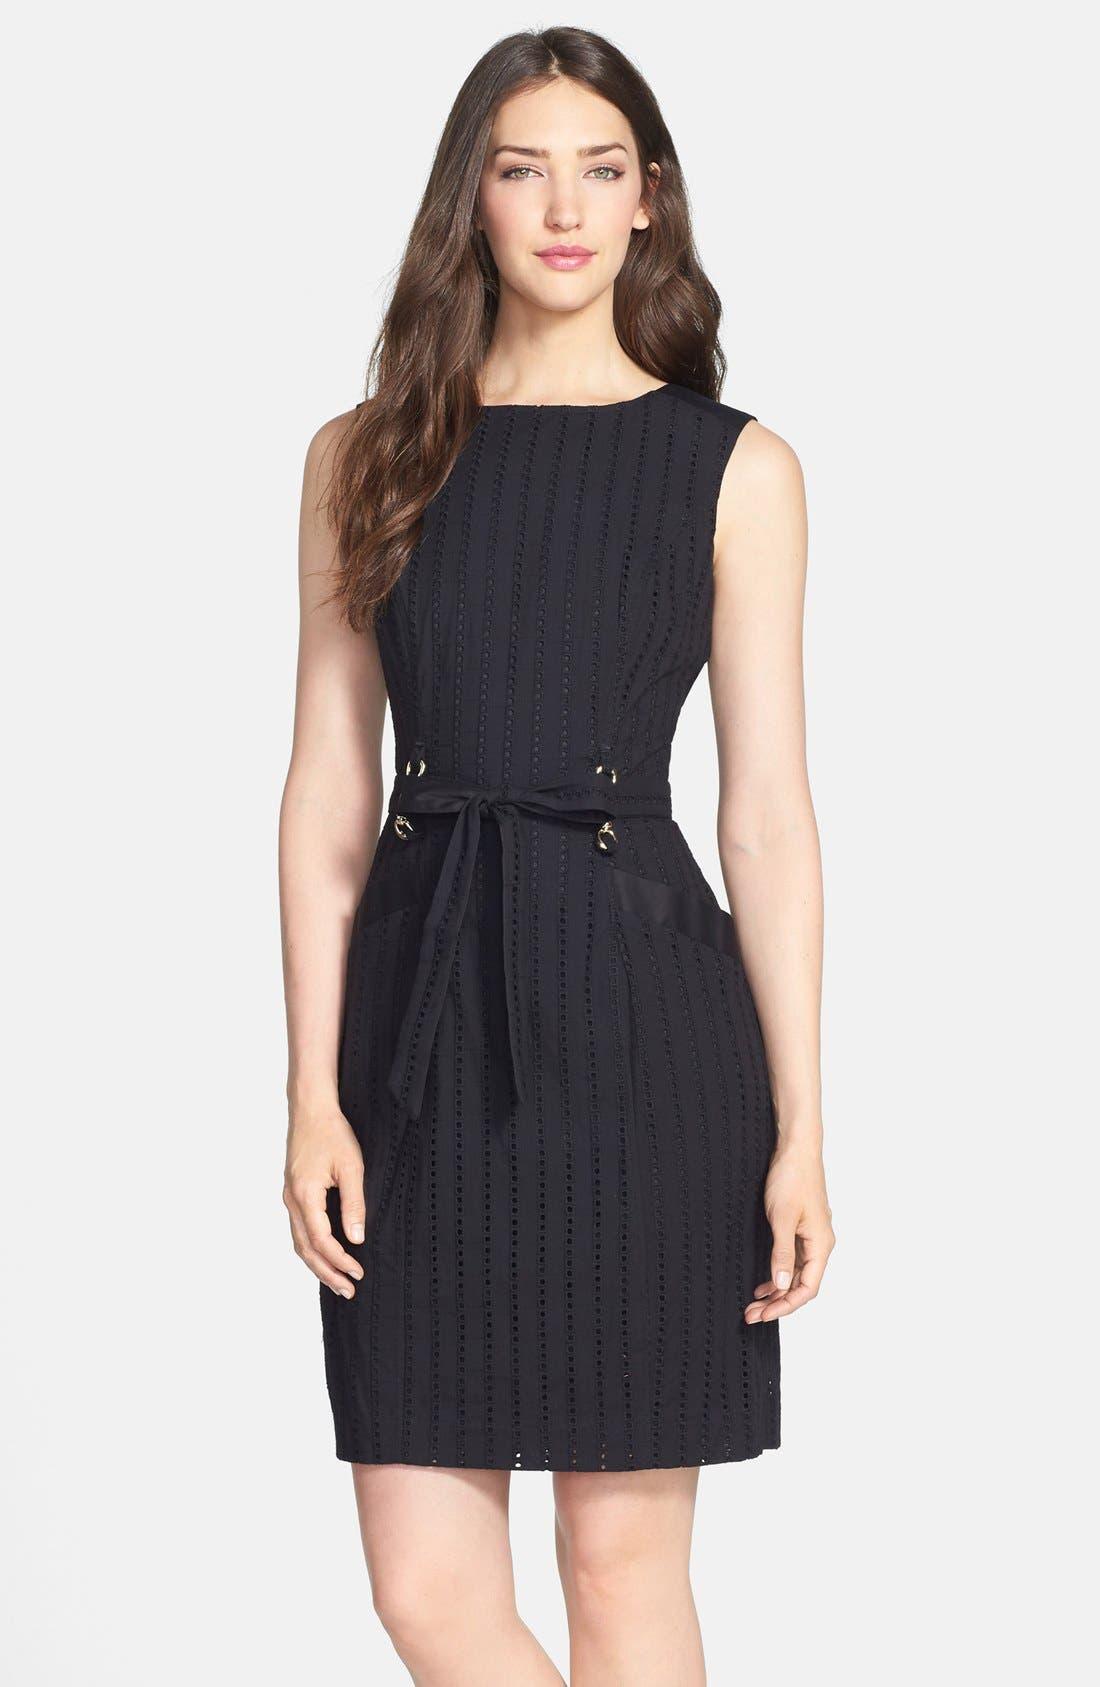 Alternate Image 1 Selected - Ellen Tracy Belted Cotton Eyelet Sheath Dress